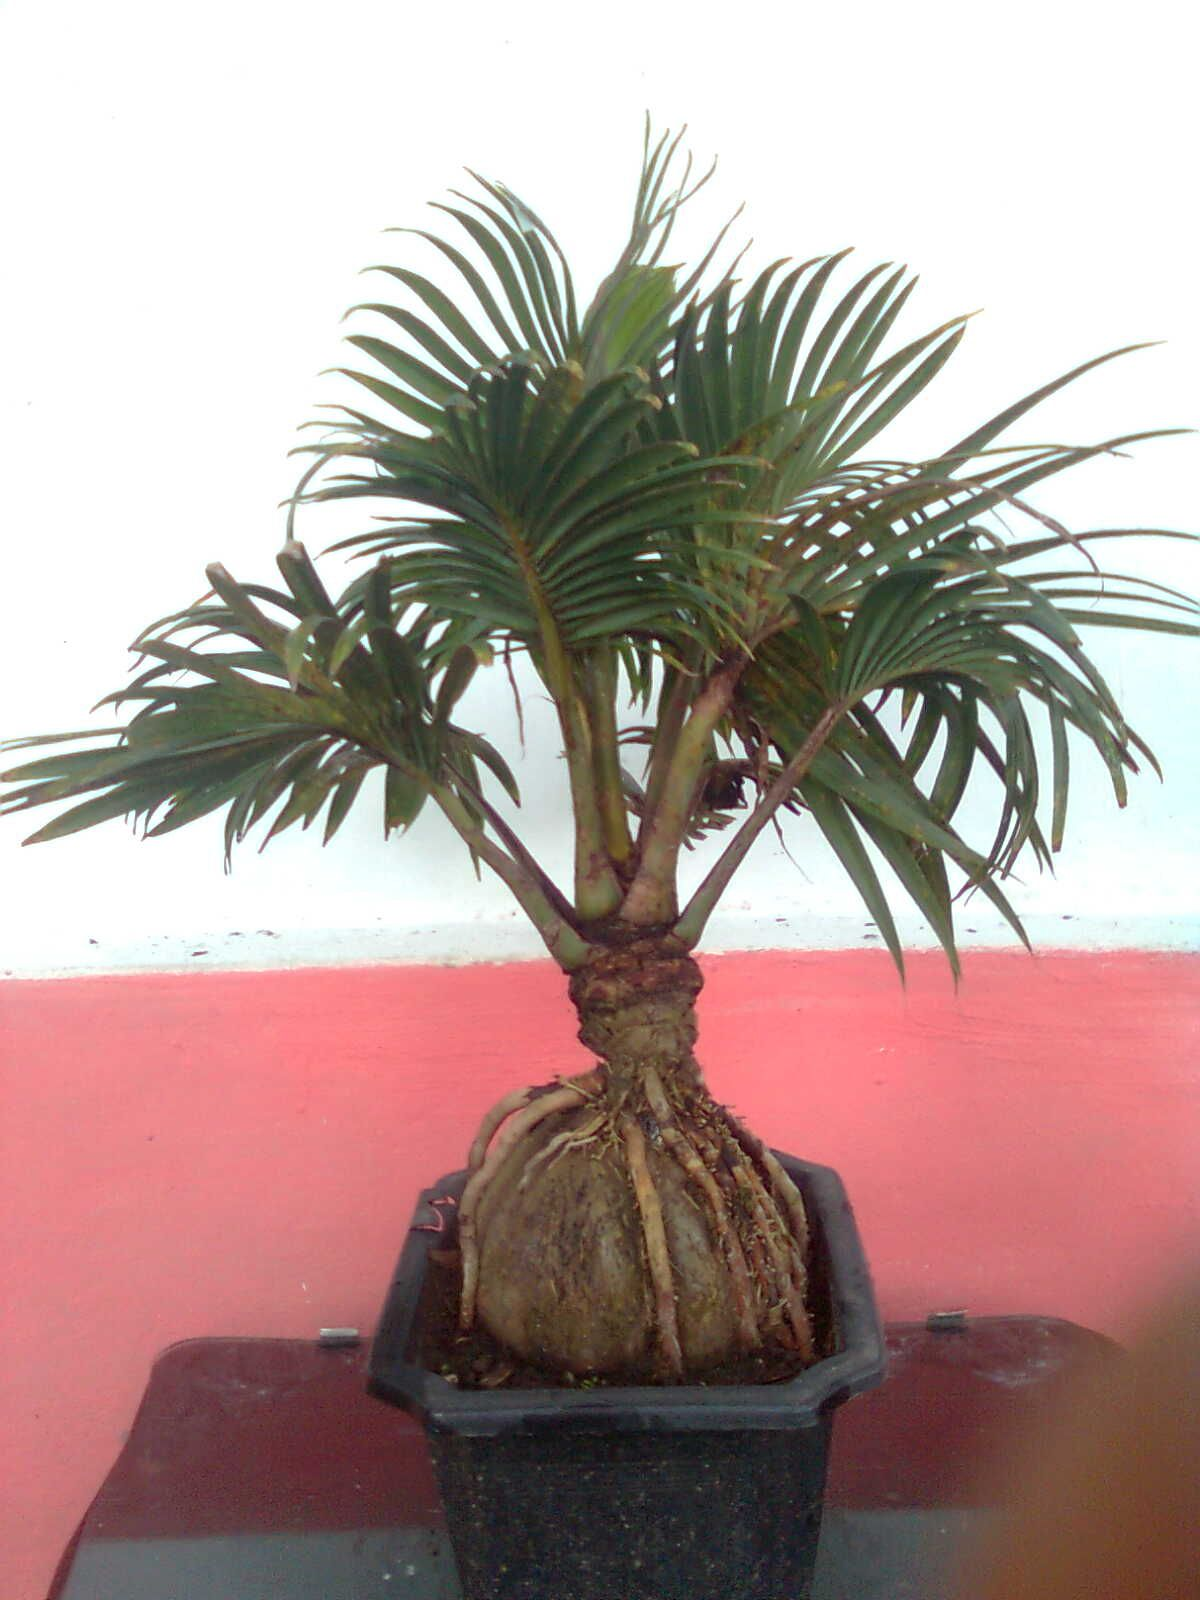 Bonsai Kelapa Ide Berkebun Pohon Bonsai Kelapa